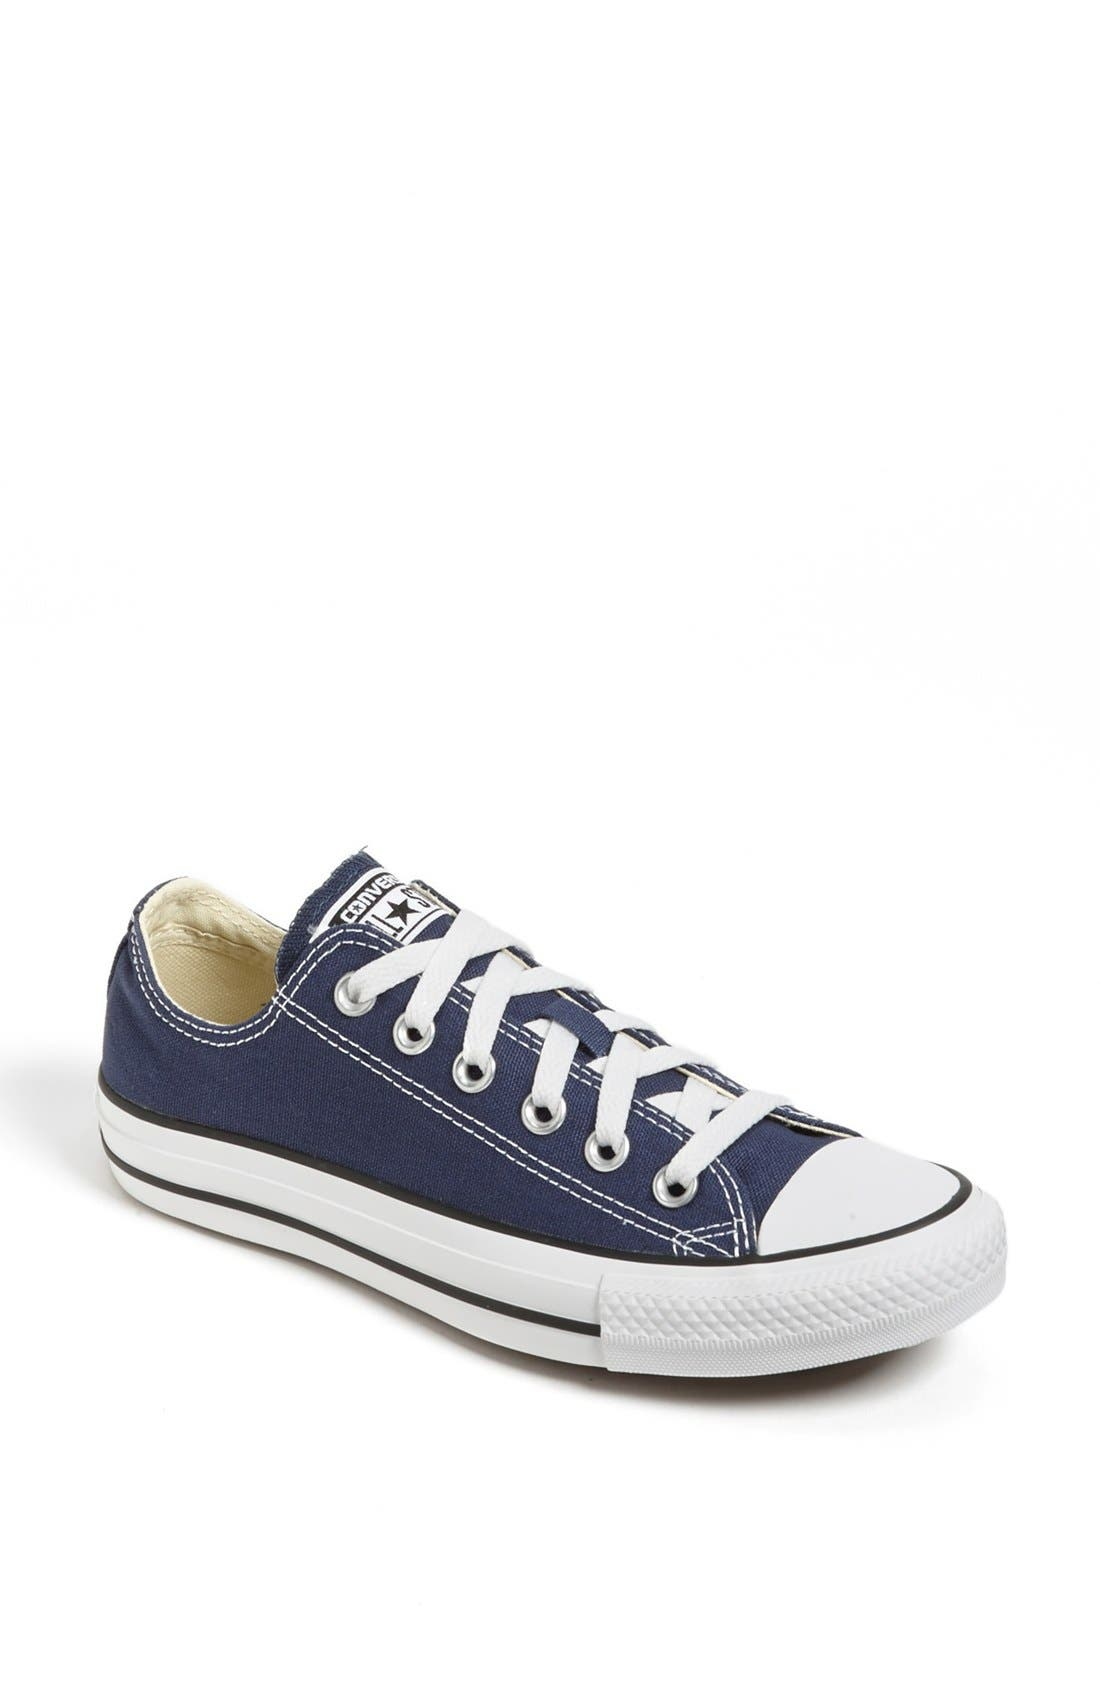 Converse Chuck Taylor Low Top Sneaker- Blue